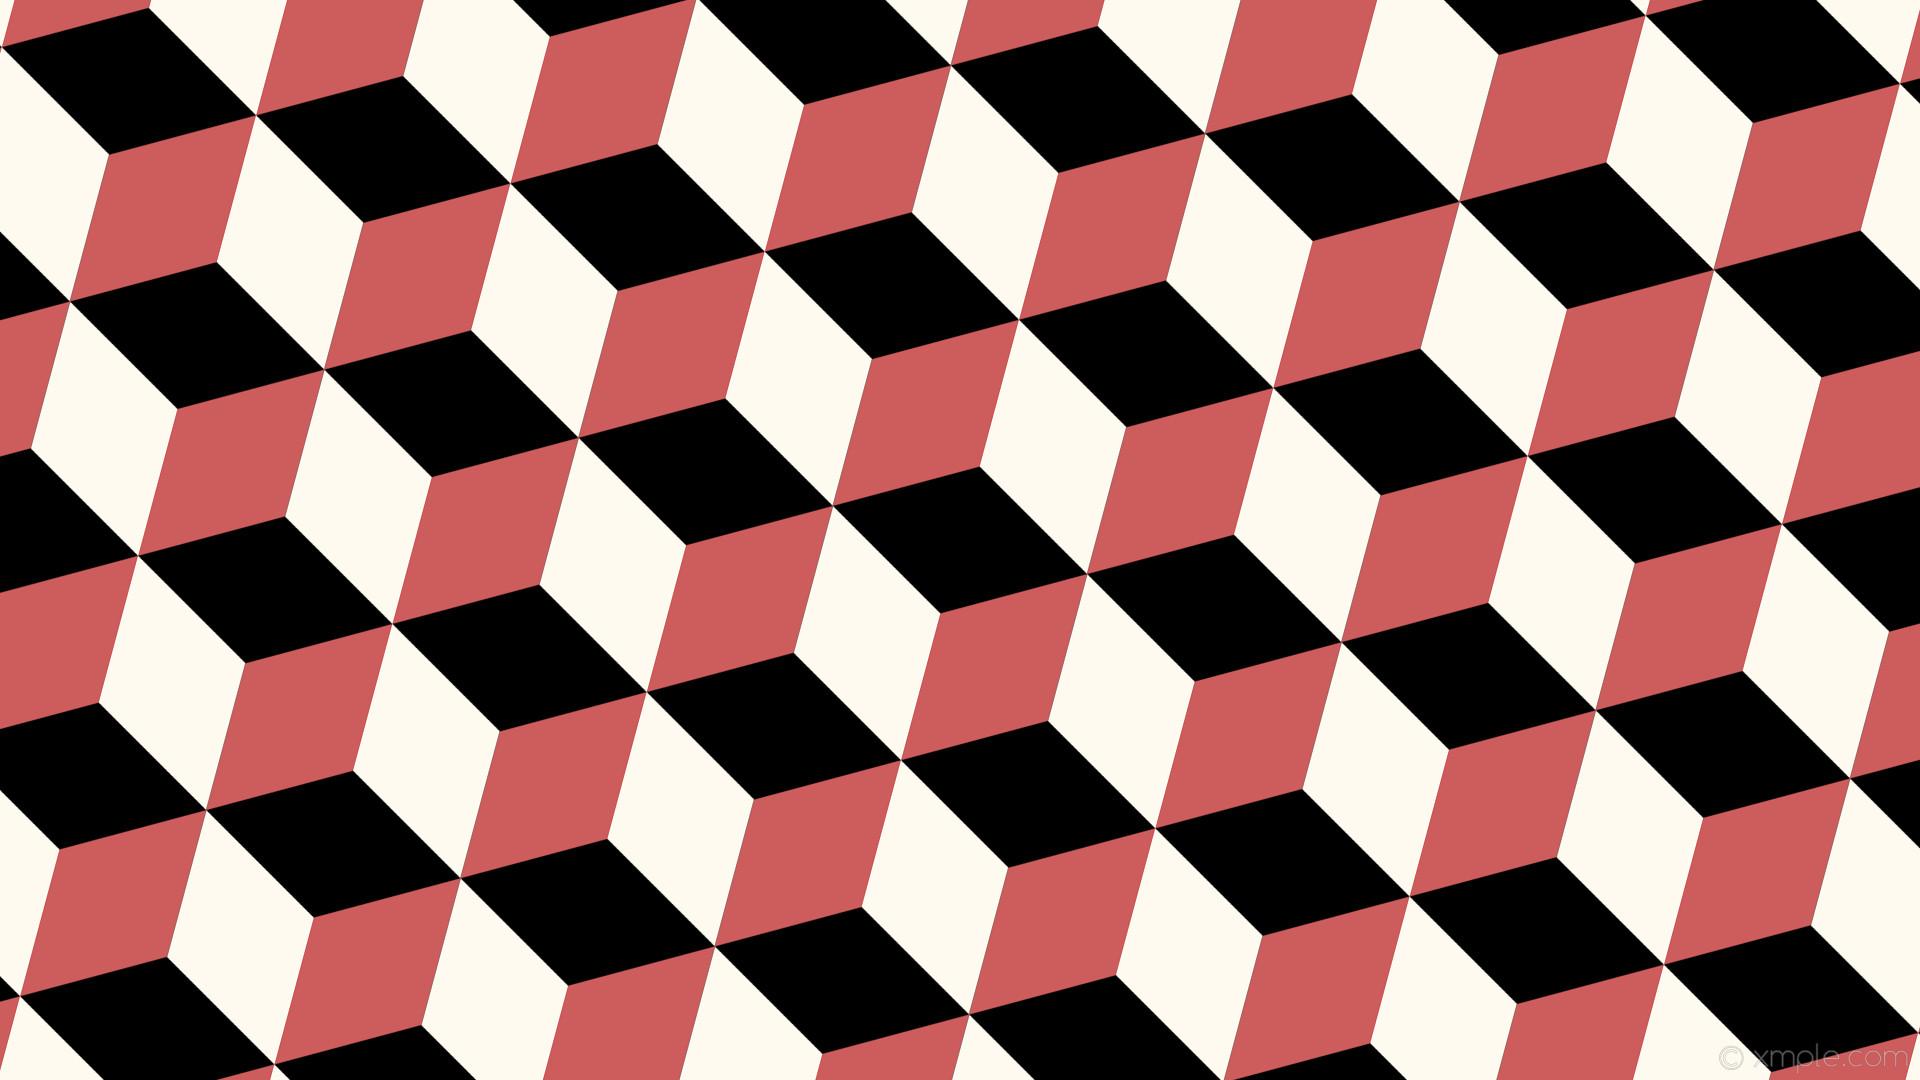 wallpaper red 3d cubes white black floral white indian red #000000 #fffaf0  #cd5c5c